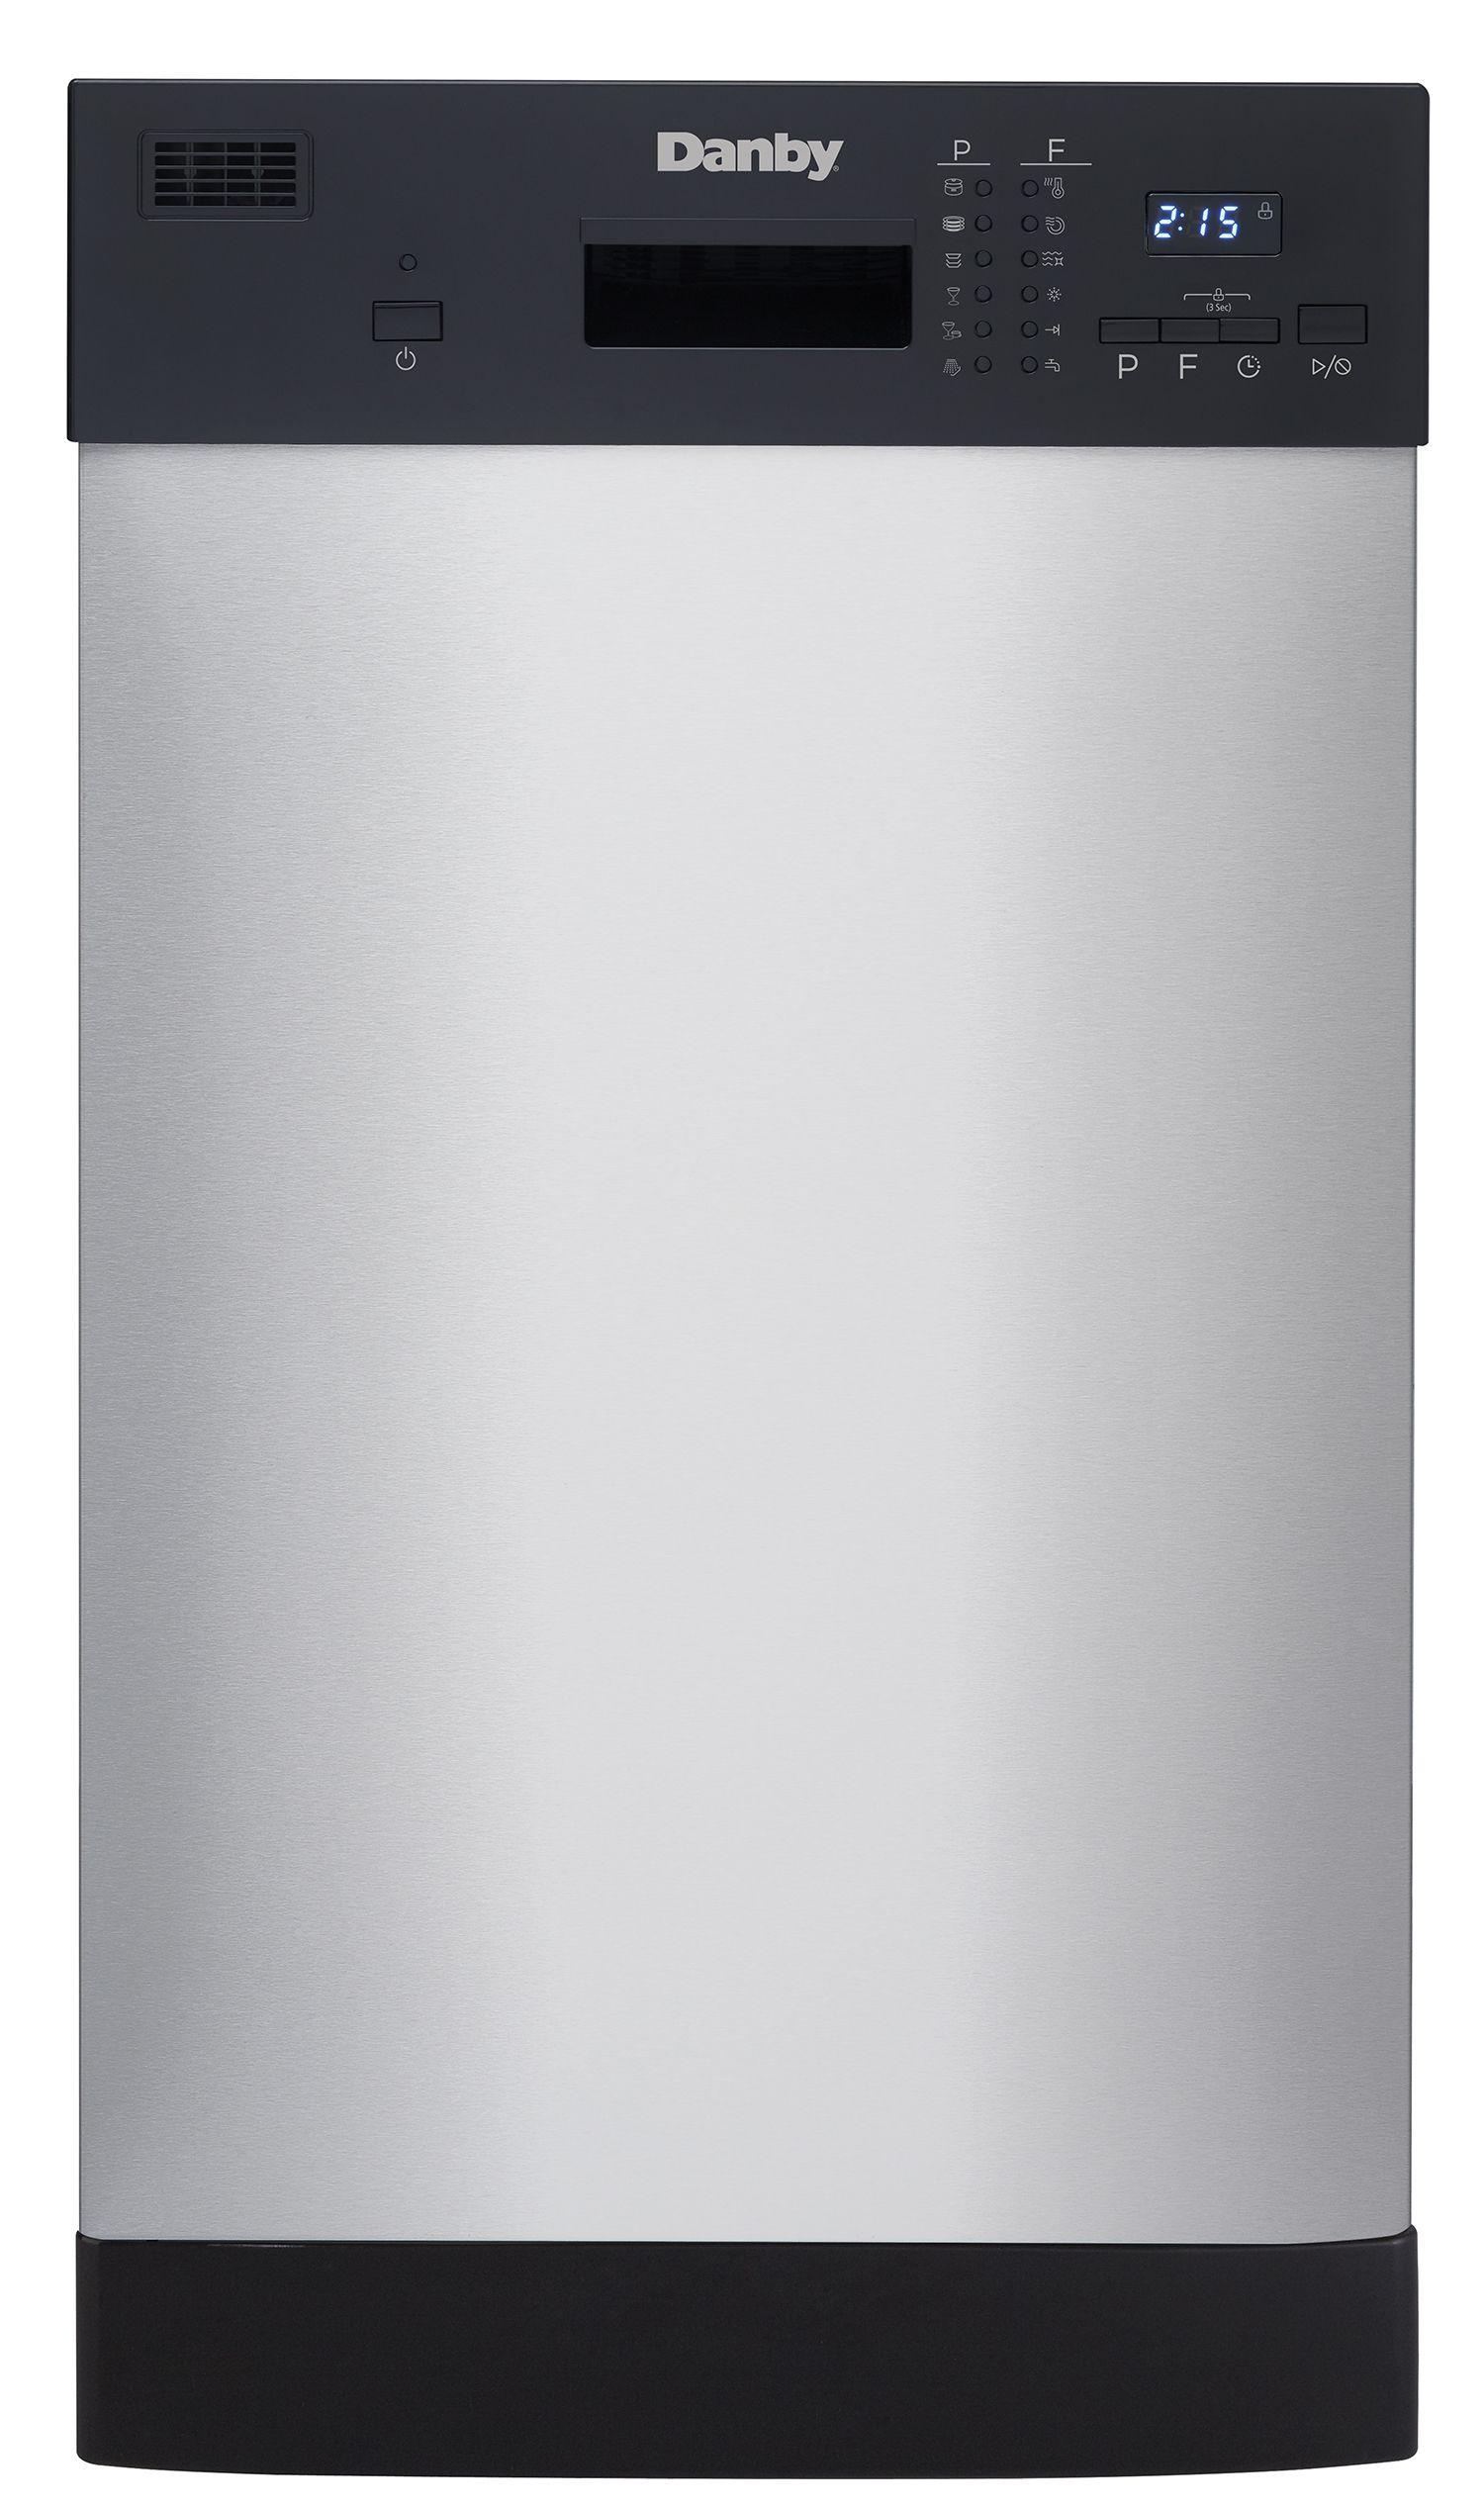 Home Built In Dishwasher Danby Steel Tub